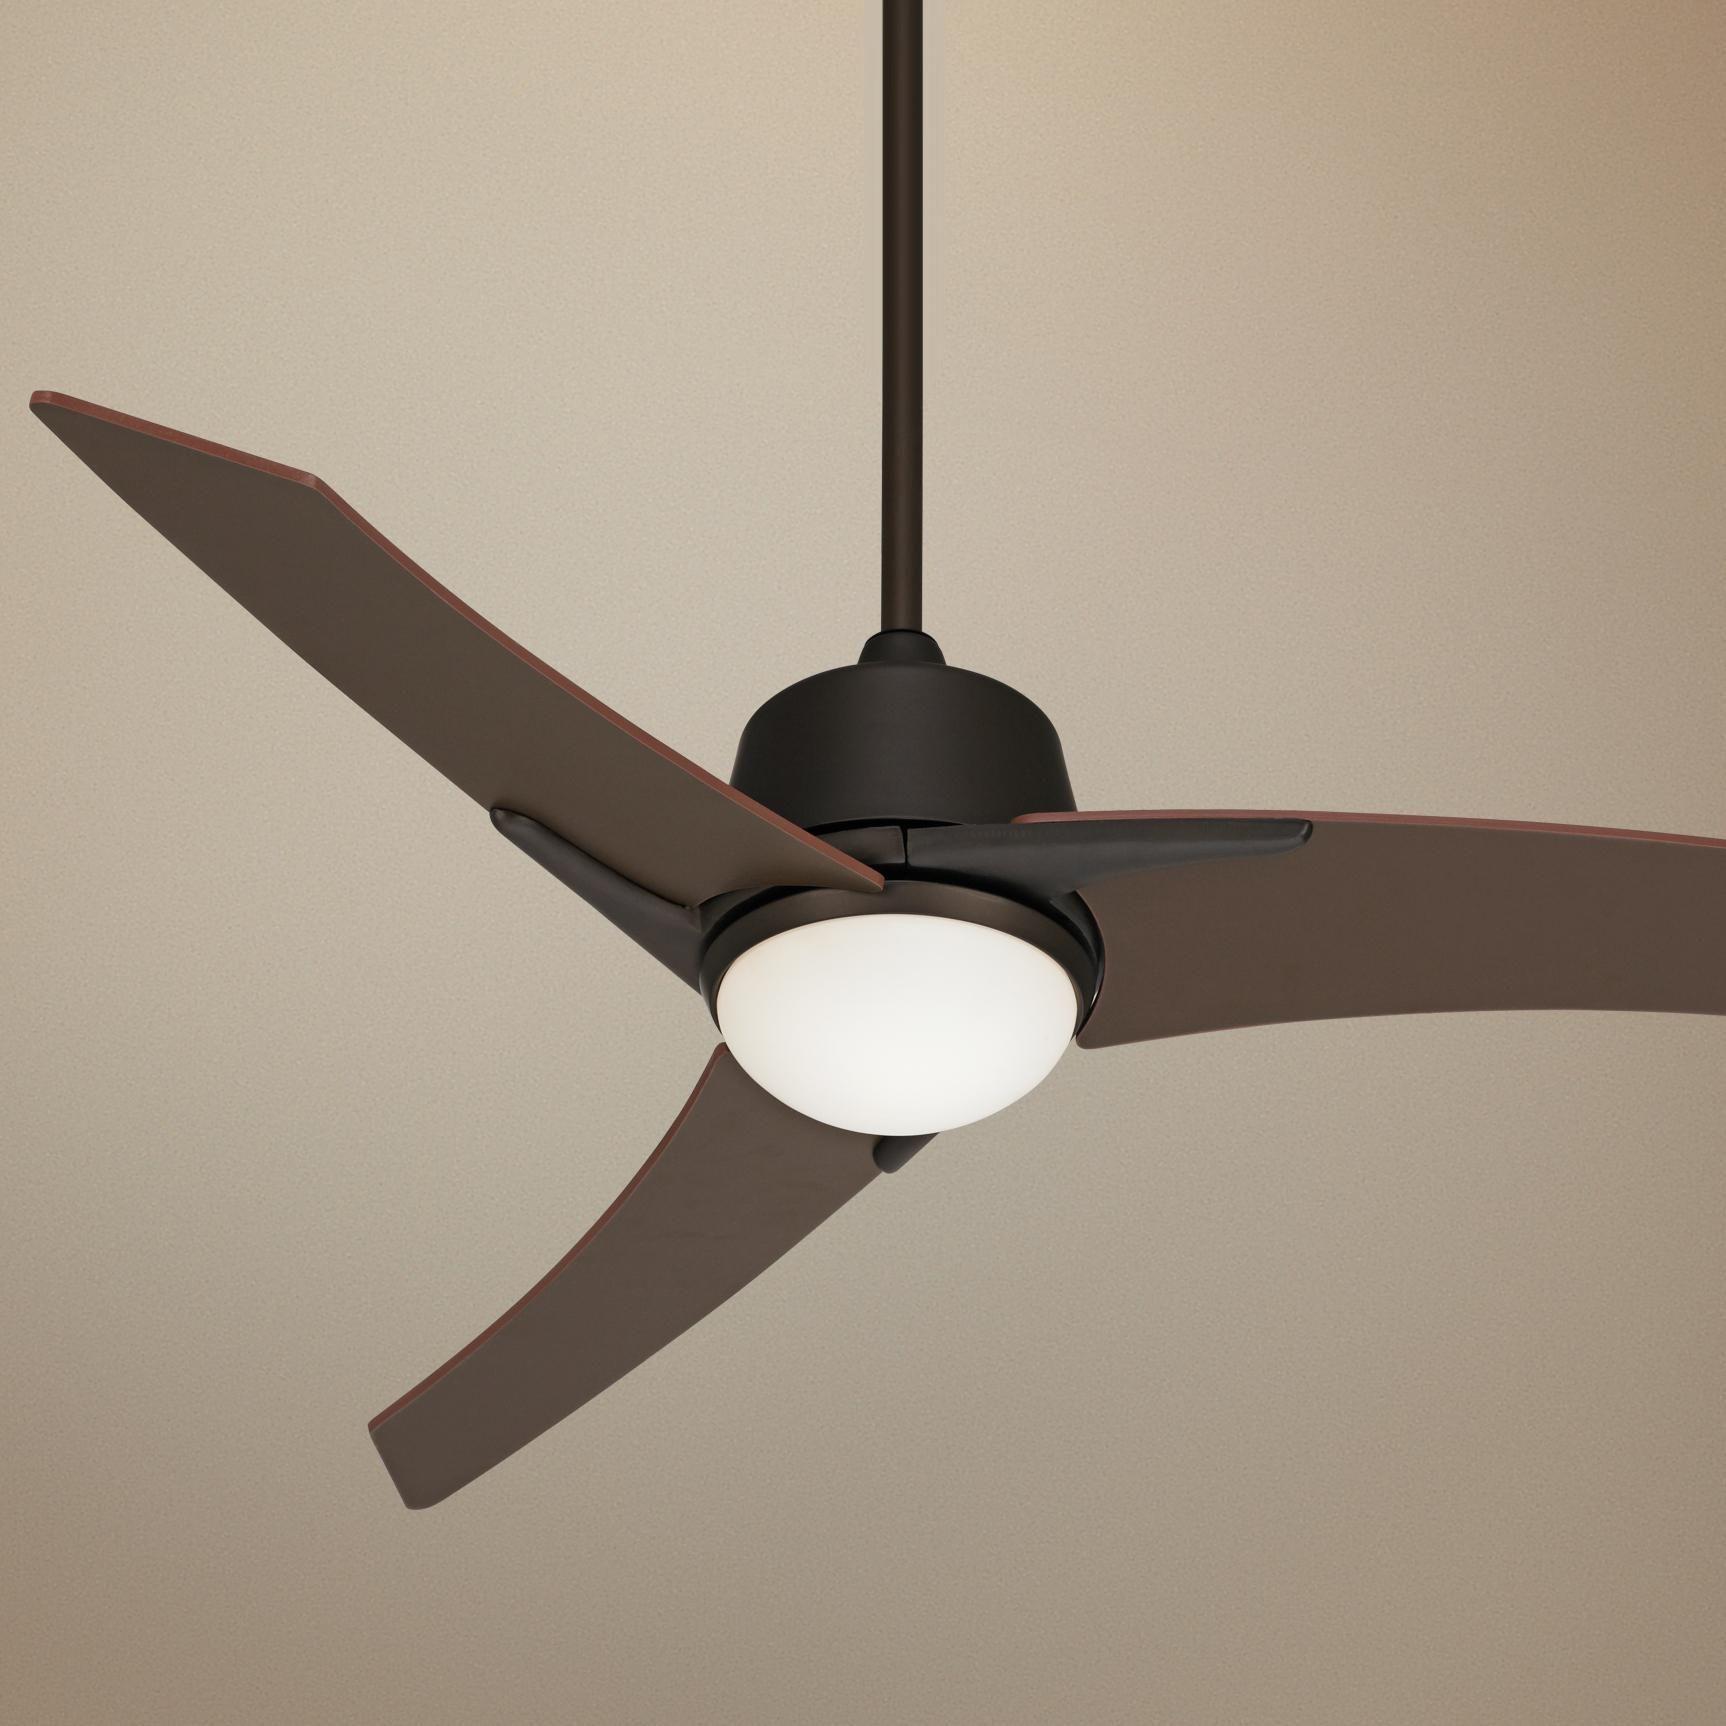 48 Casa Vieja Matrix Oil Rubbed Bronze Ceiling Fan U9636 Lamps Plus Ceiling Fan Bronze Ceiling Fan Modern Ceiling Fan